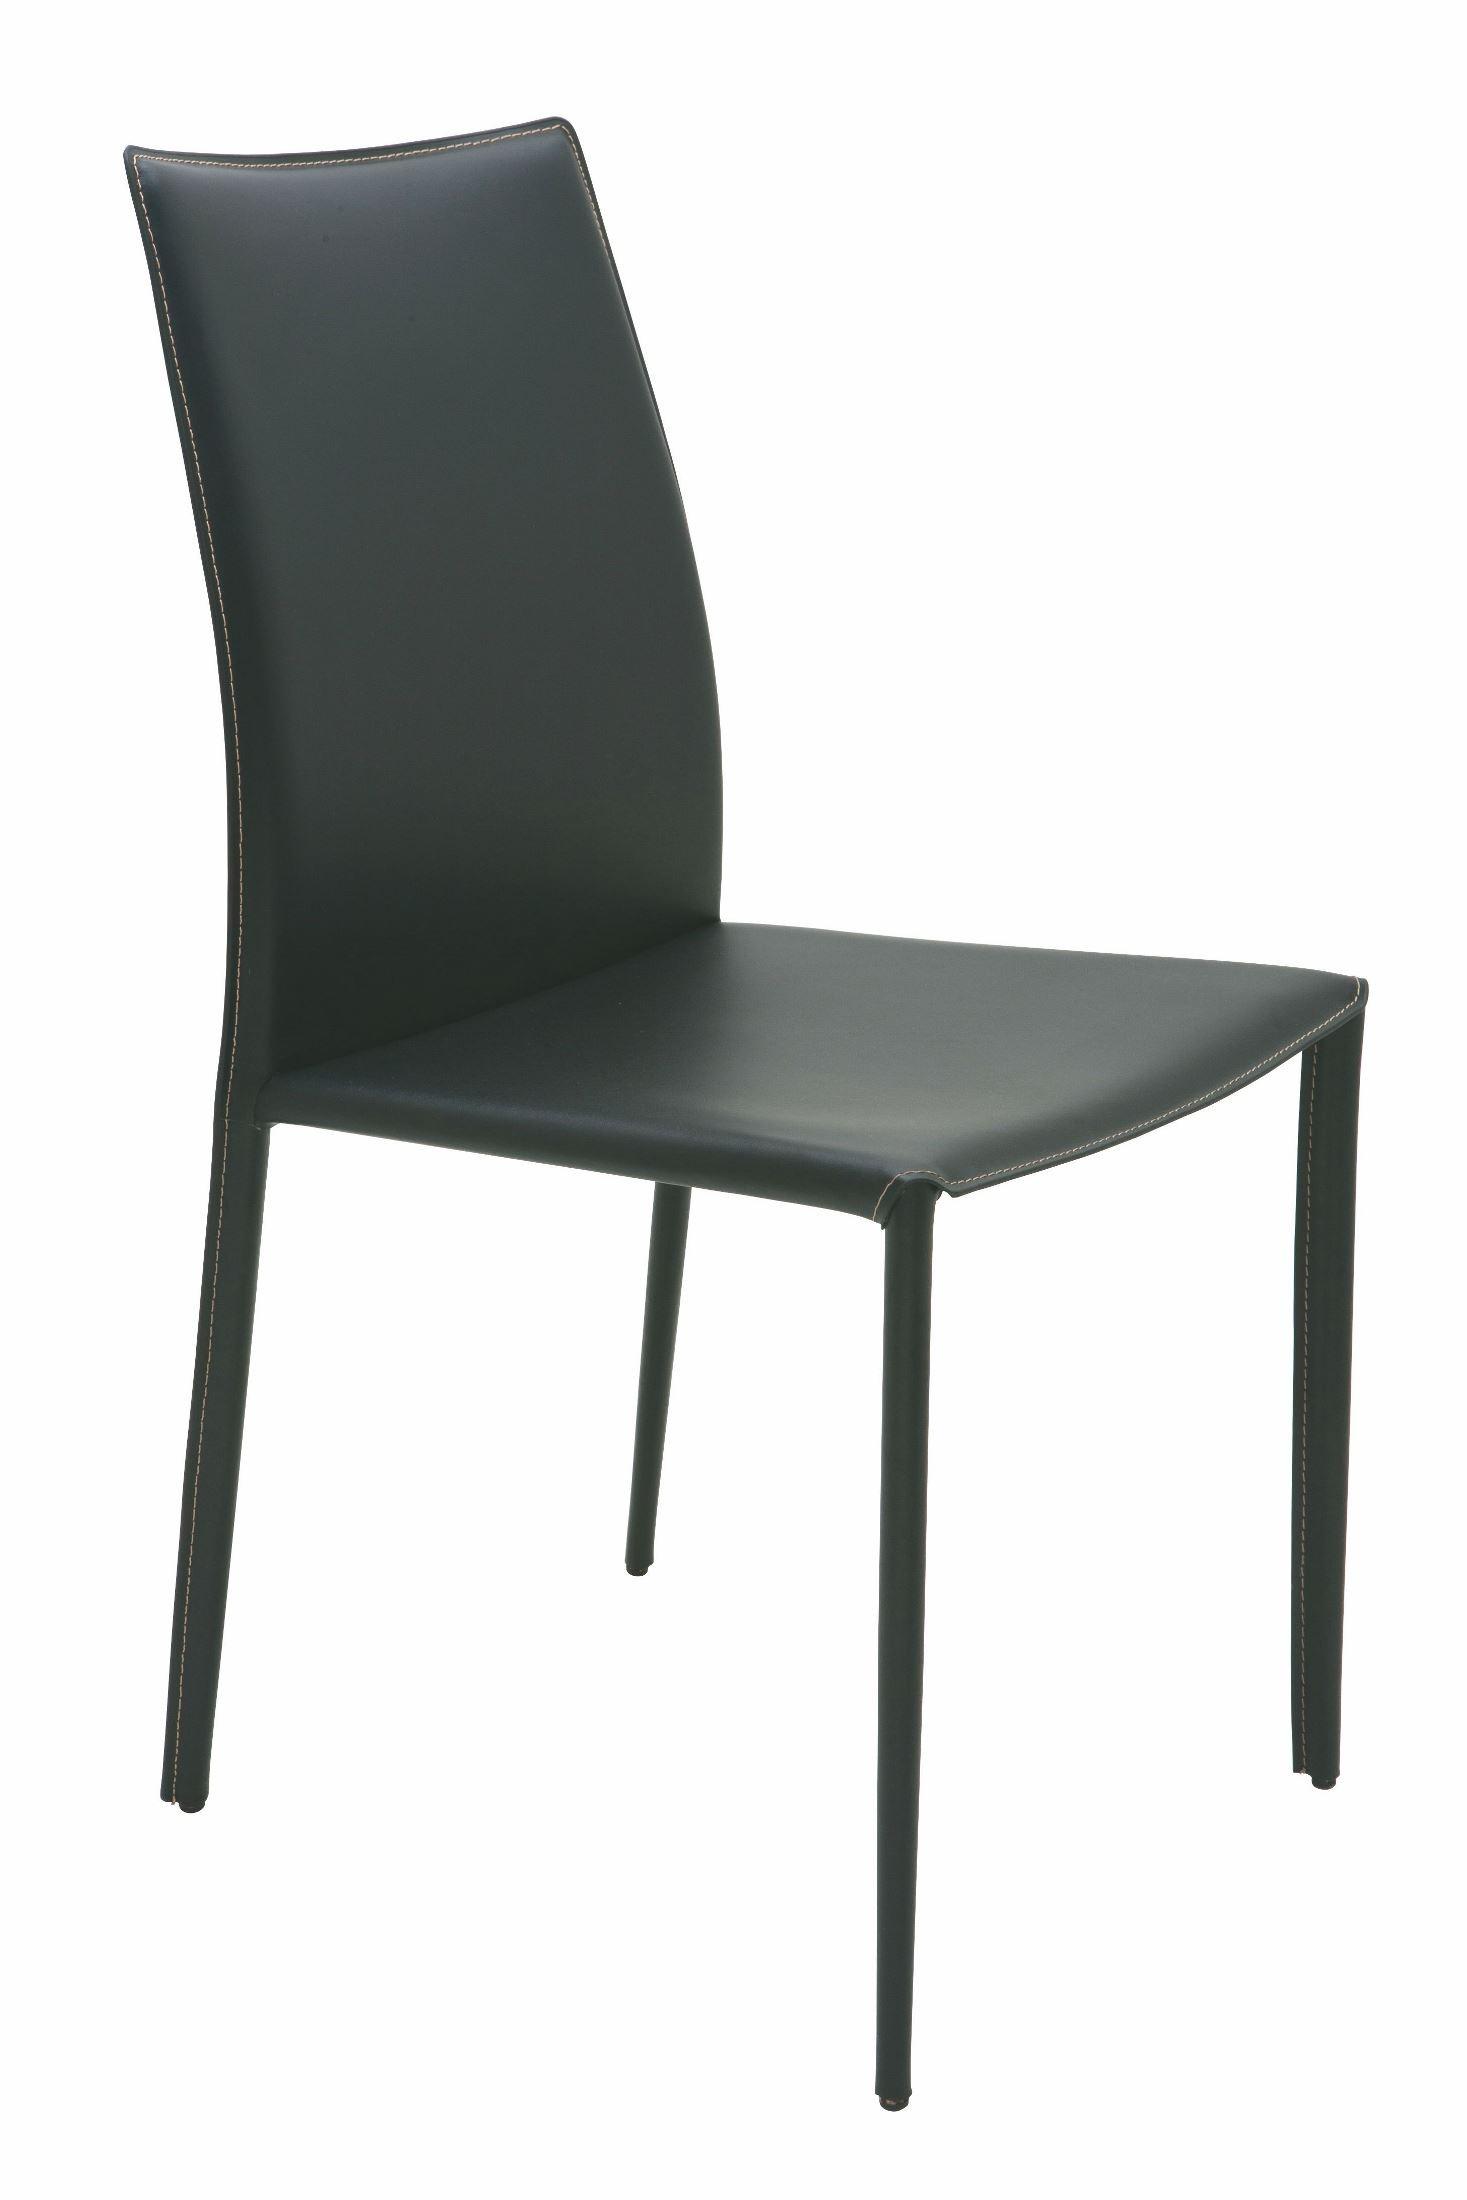 black leather chair dining bean bag baby sienna hgga283 nuevo